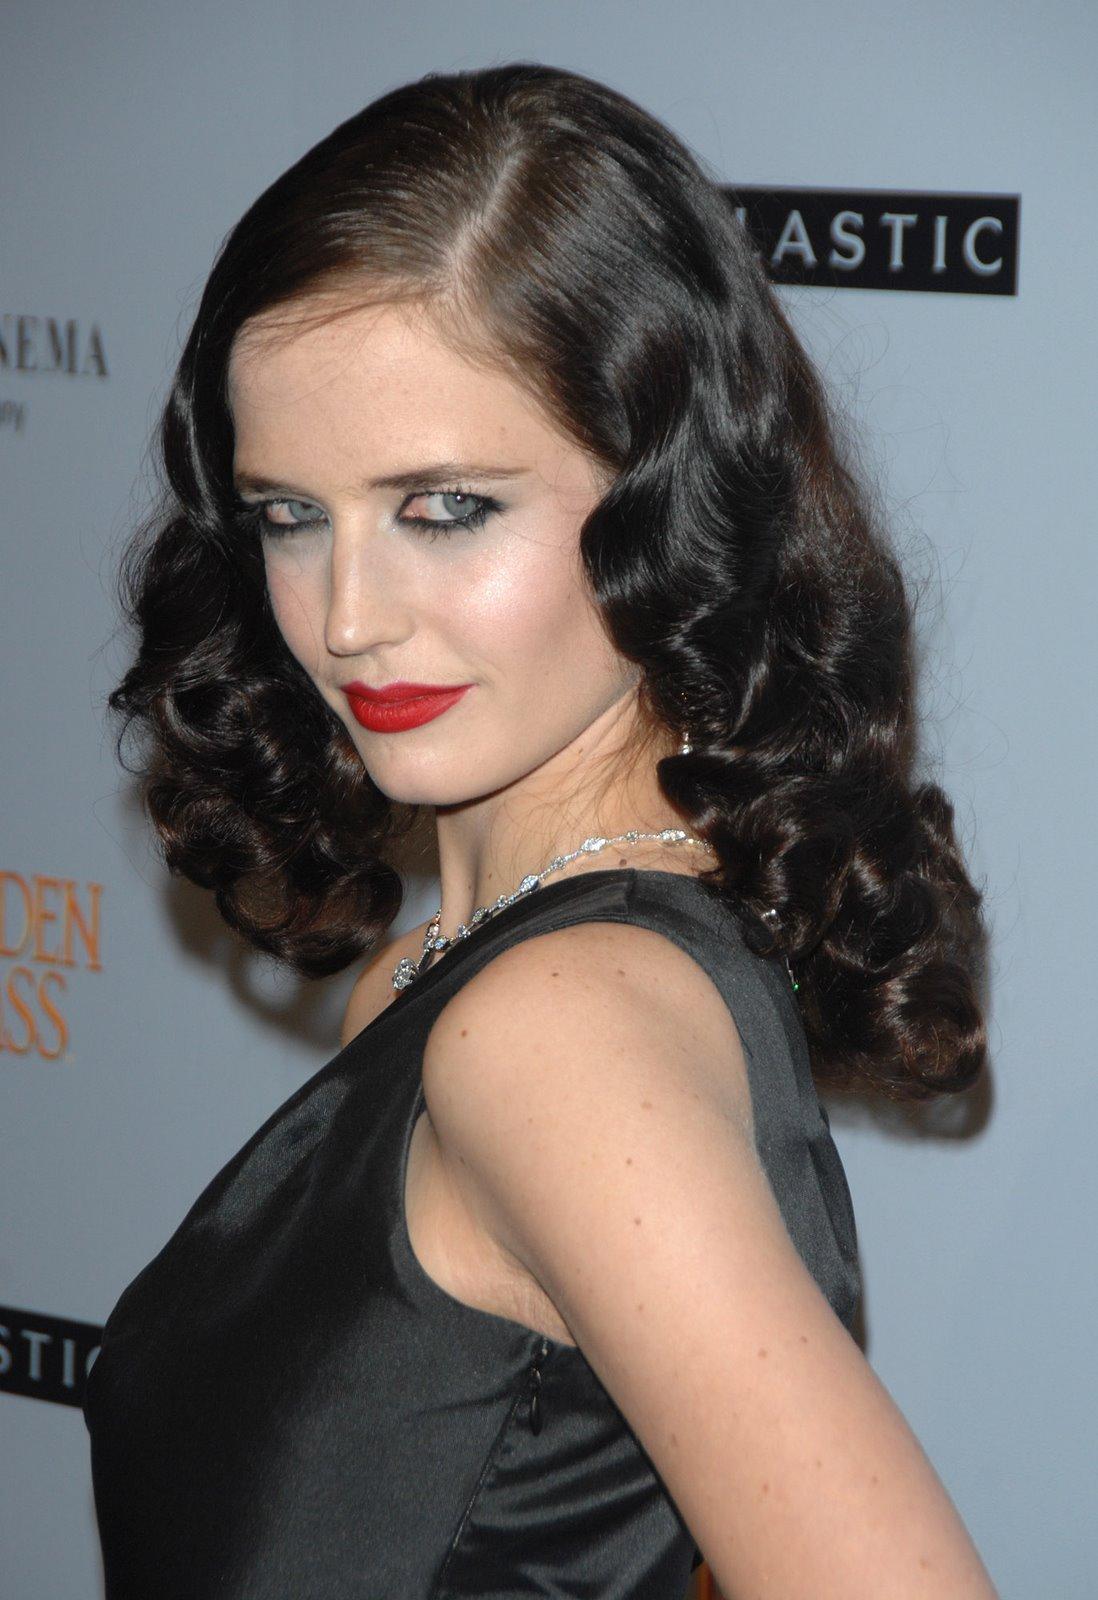 http://3.bp.blogspot.com/-sN6gSrGBQ7I/TqMuaz47WQI/AAAAAAAACUo/JLMq9wAlvMw/s1600/Eva+Green+hairstyles+%25283%2529.jpg